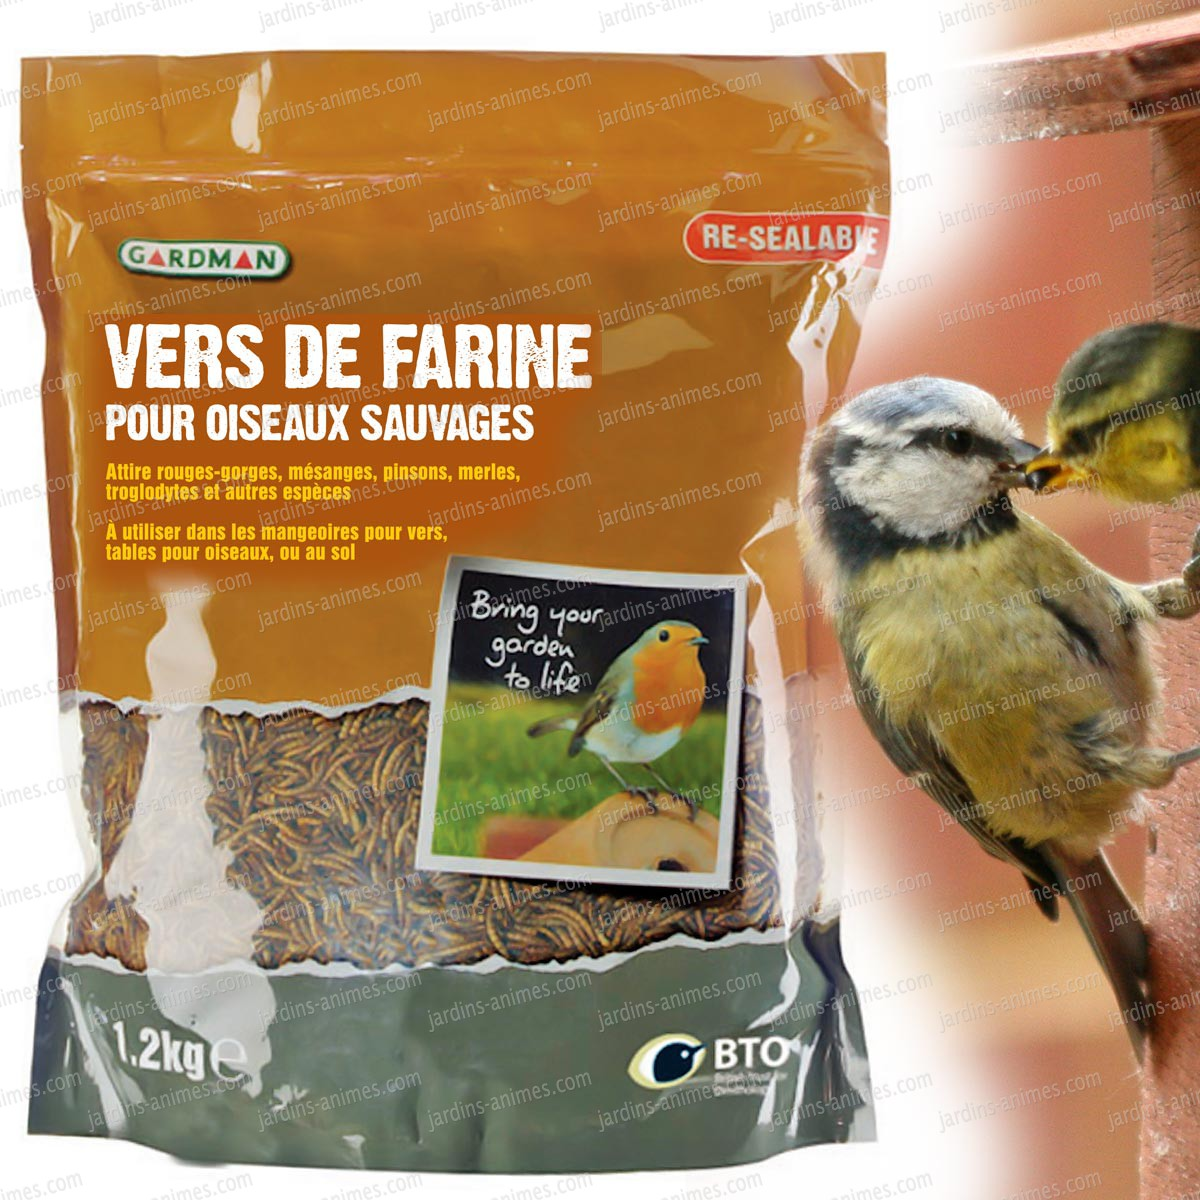 nourriture oiseaux sauvages